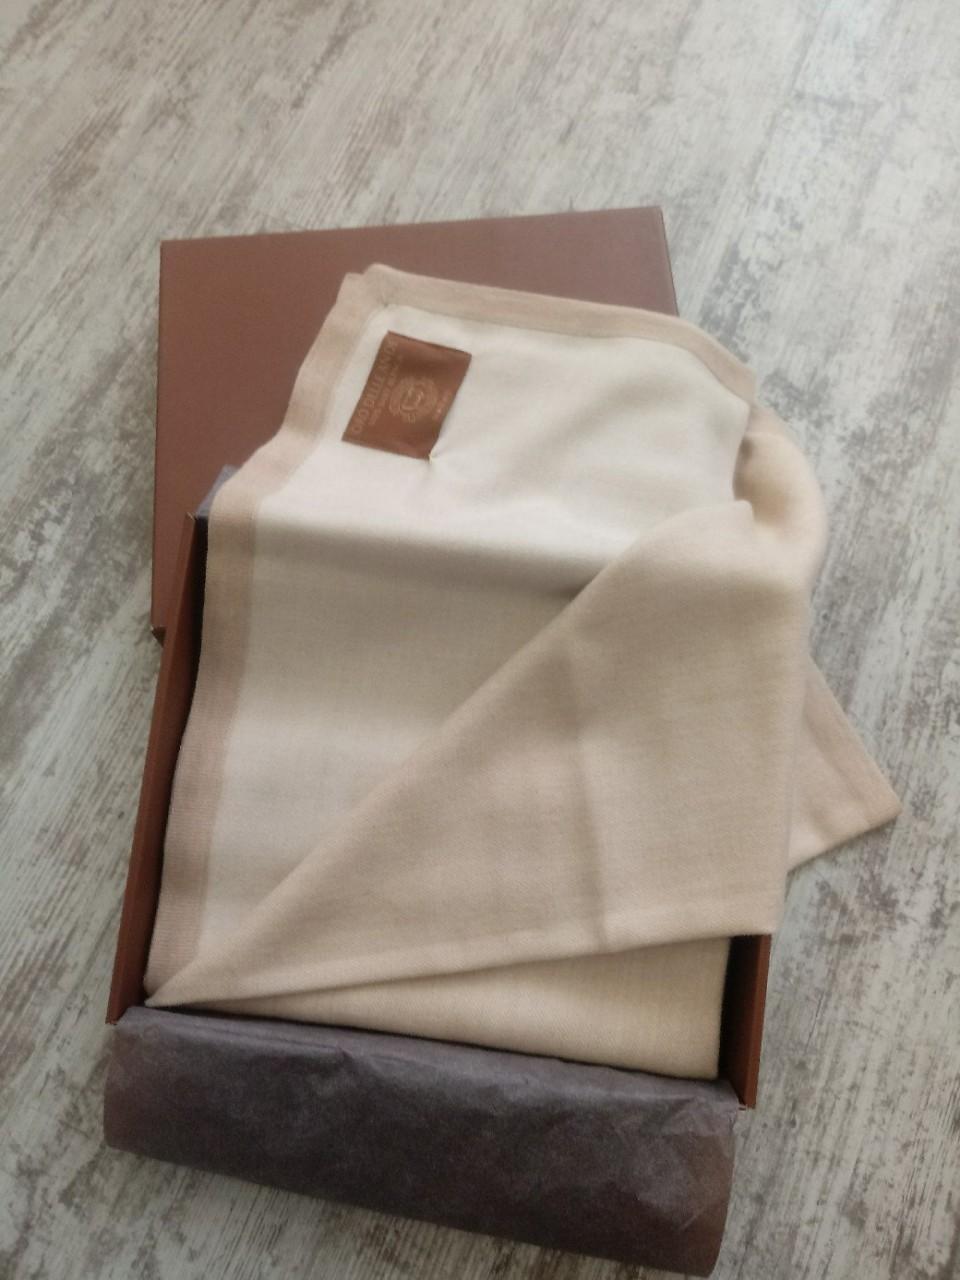 Пледы Плед 130х180 Cumbi от Zambaiti коричневый sherstyanoy-pled-cumbi-ot-zambaiti-foto.jpg